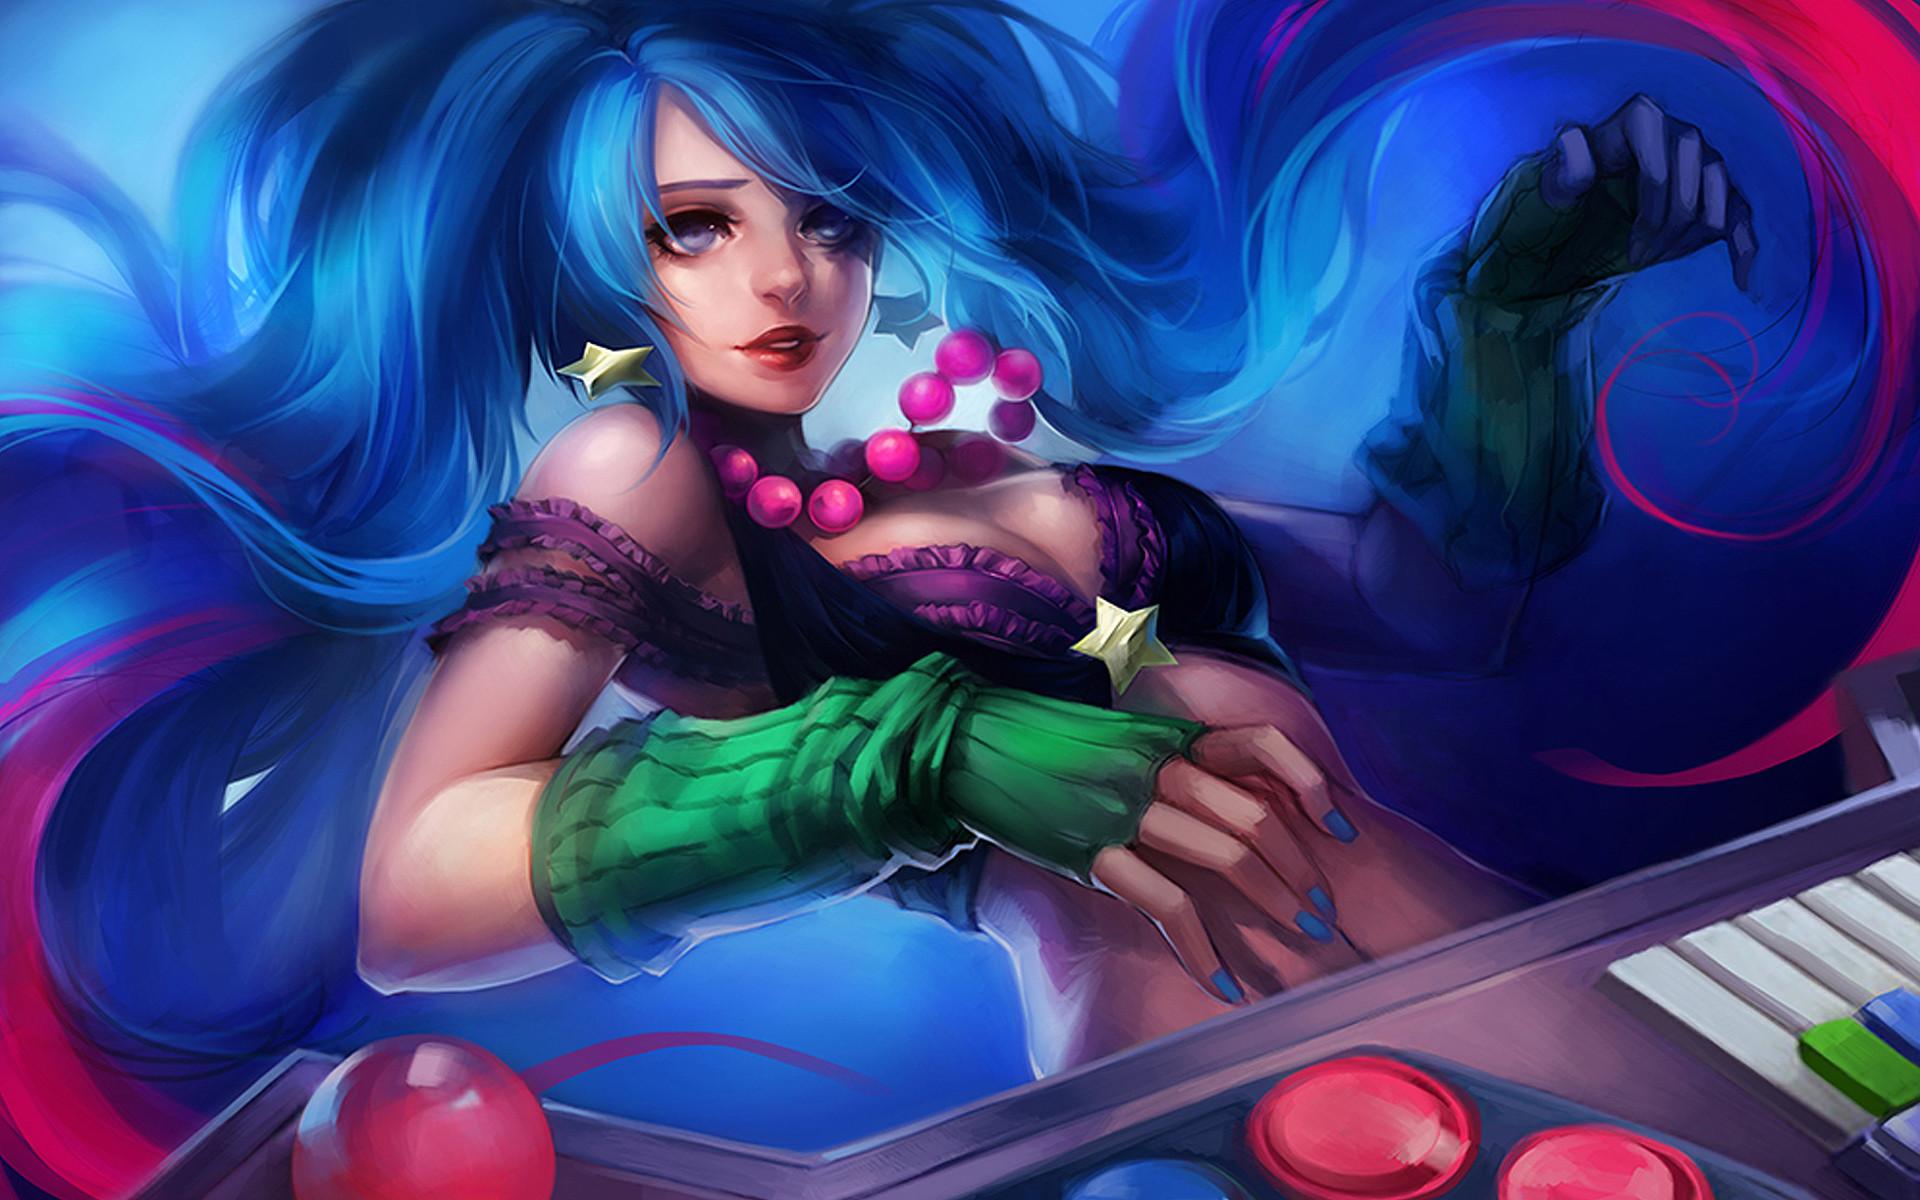 Arcade Sona Skin Splash League of Legends HD Wallpaper Ippus Girl